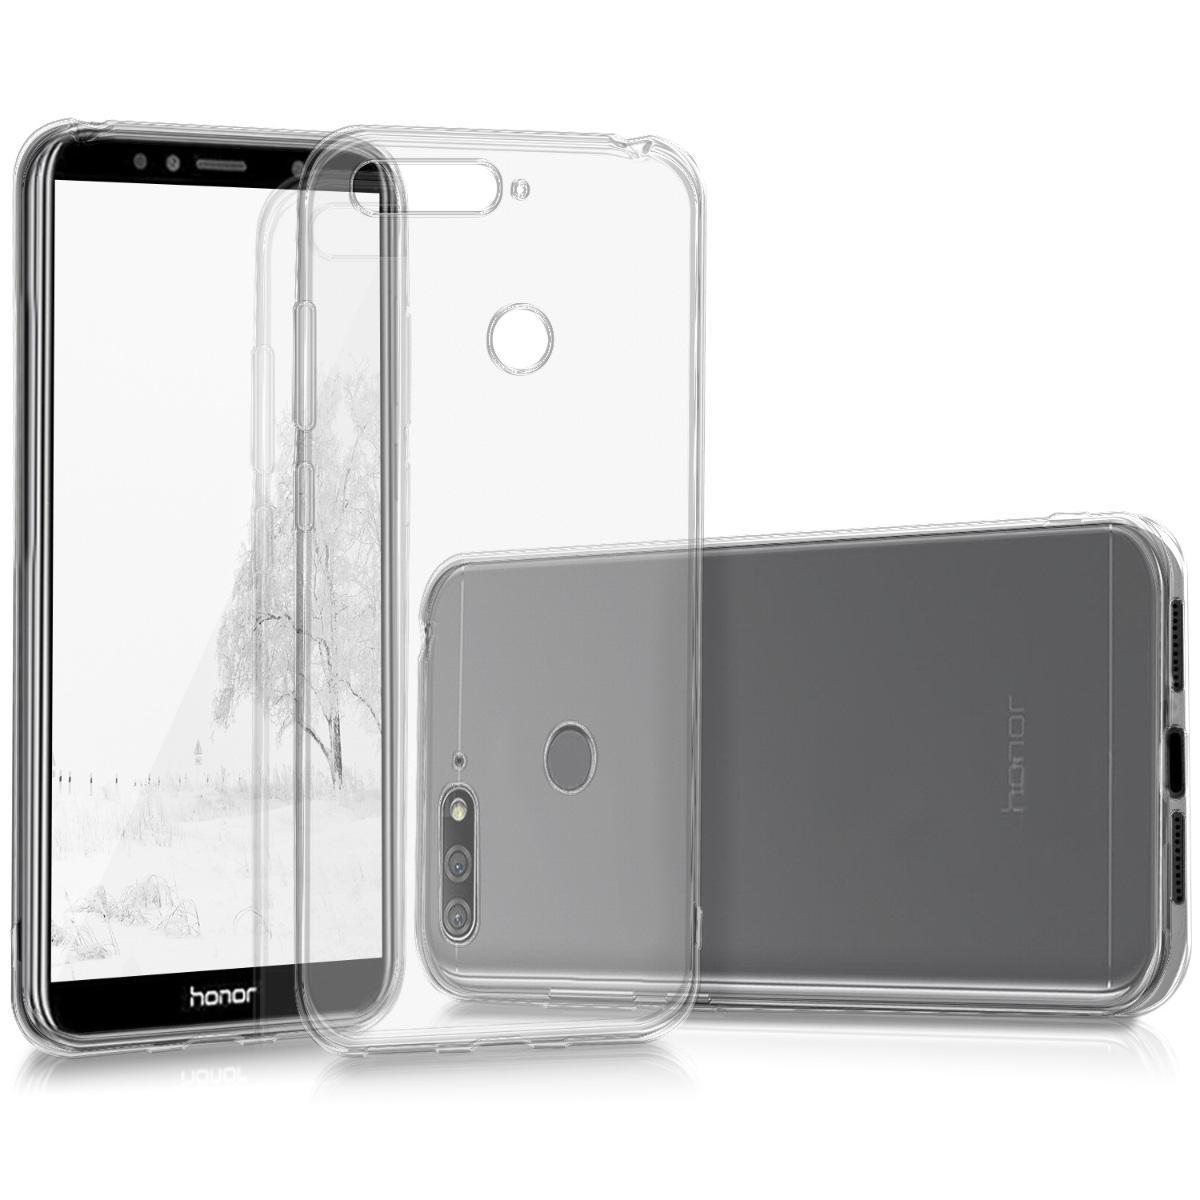 KW Διάφανη Θήκη Σιλικόνης Huawei Honor 7A (44825.03)